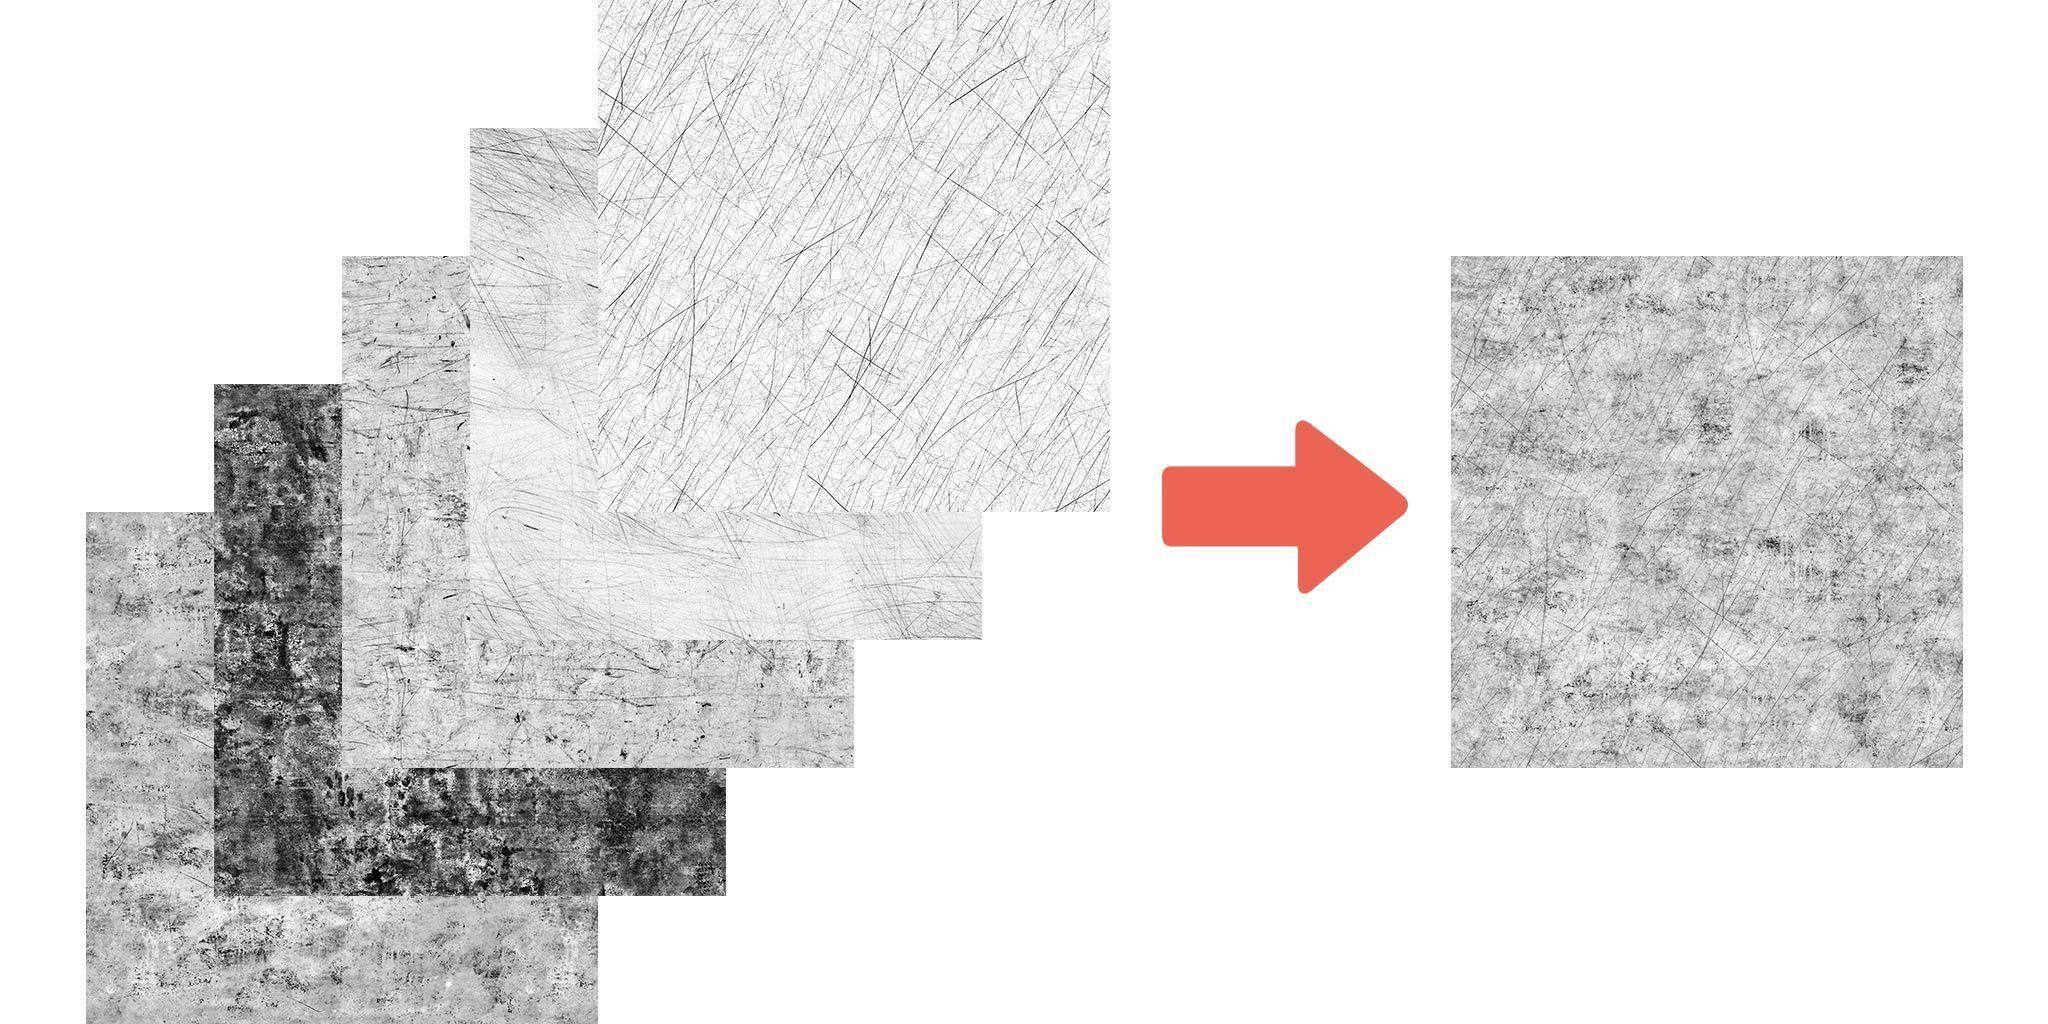 Pack 01 - Dirt Textures